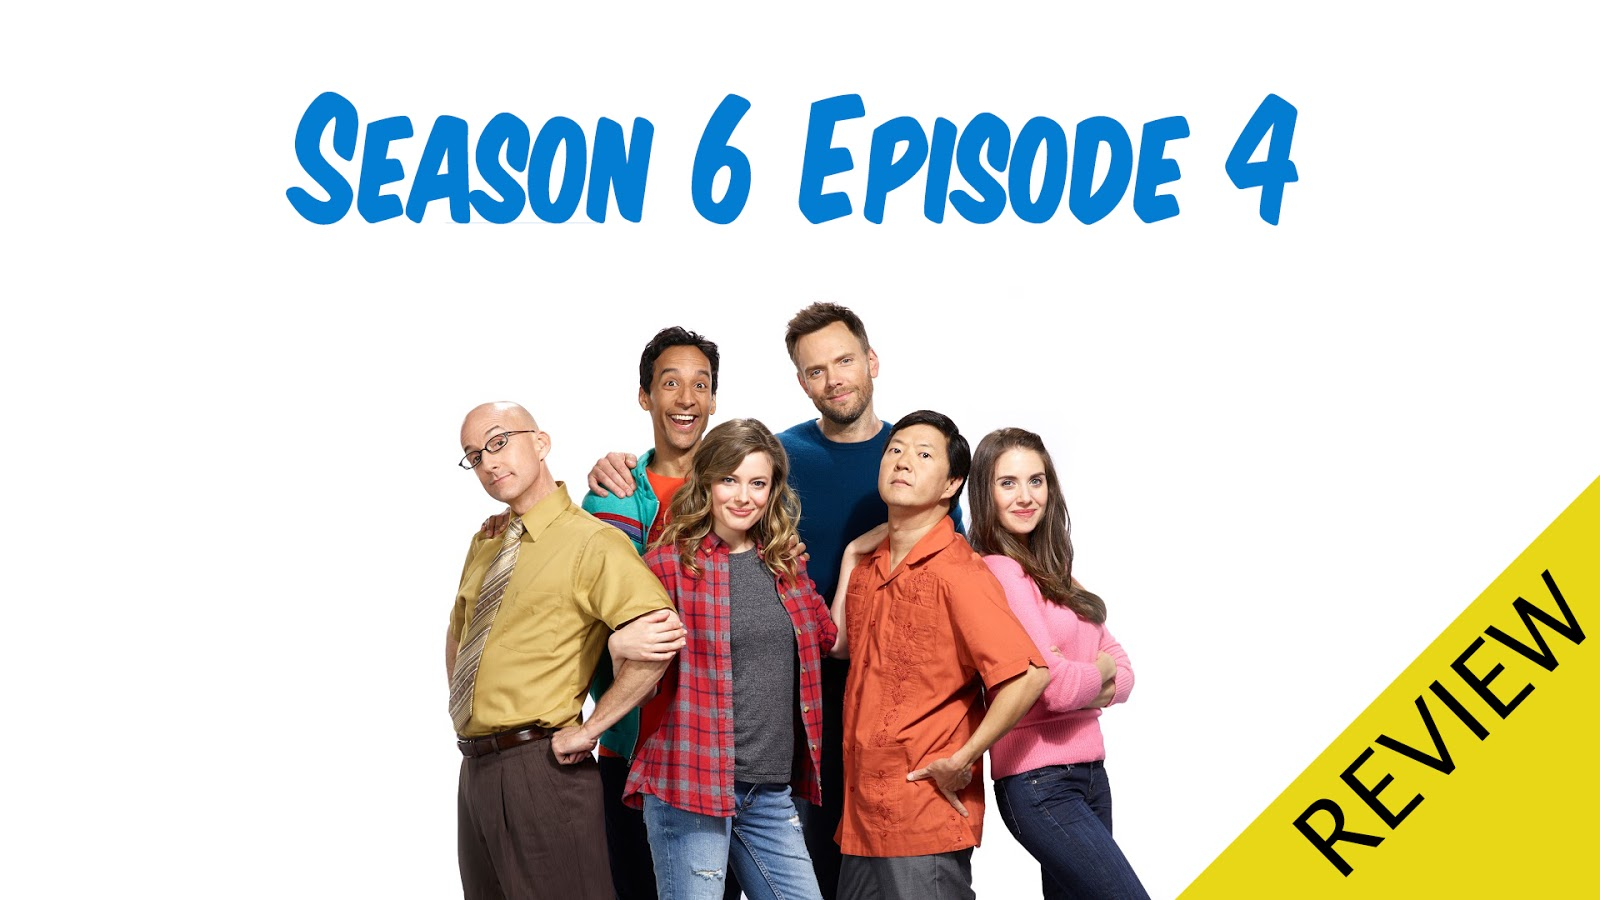 REVIEW - Community Season 6 Episode 4